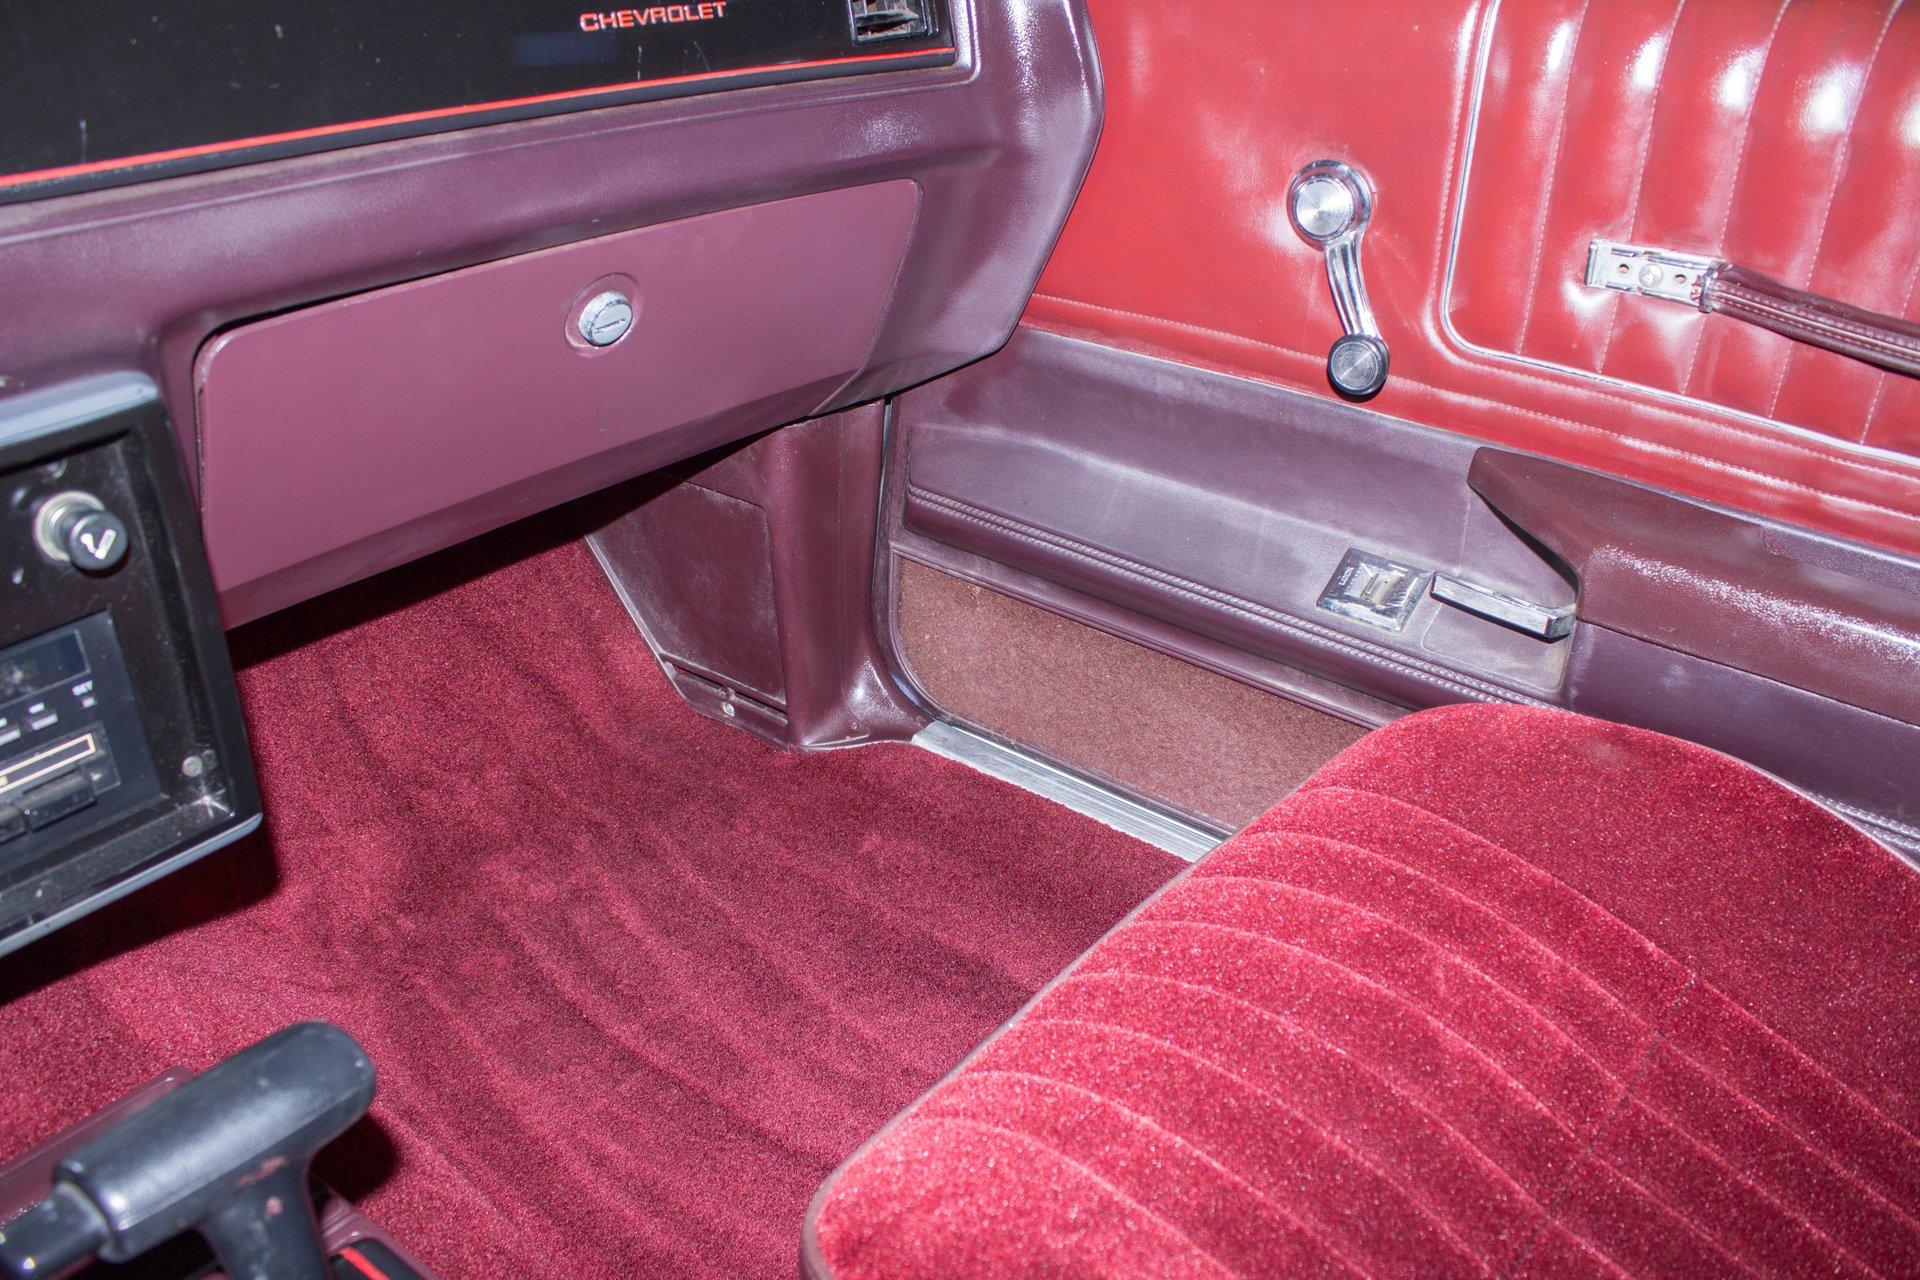 1987 Chevrolet Monte Carlo SS Aero | Classic Cars & Used